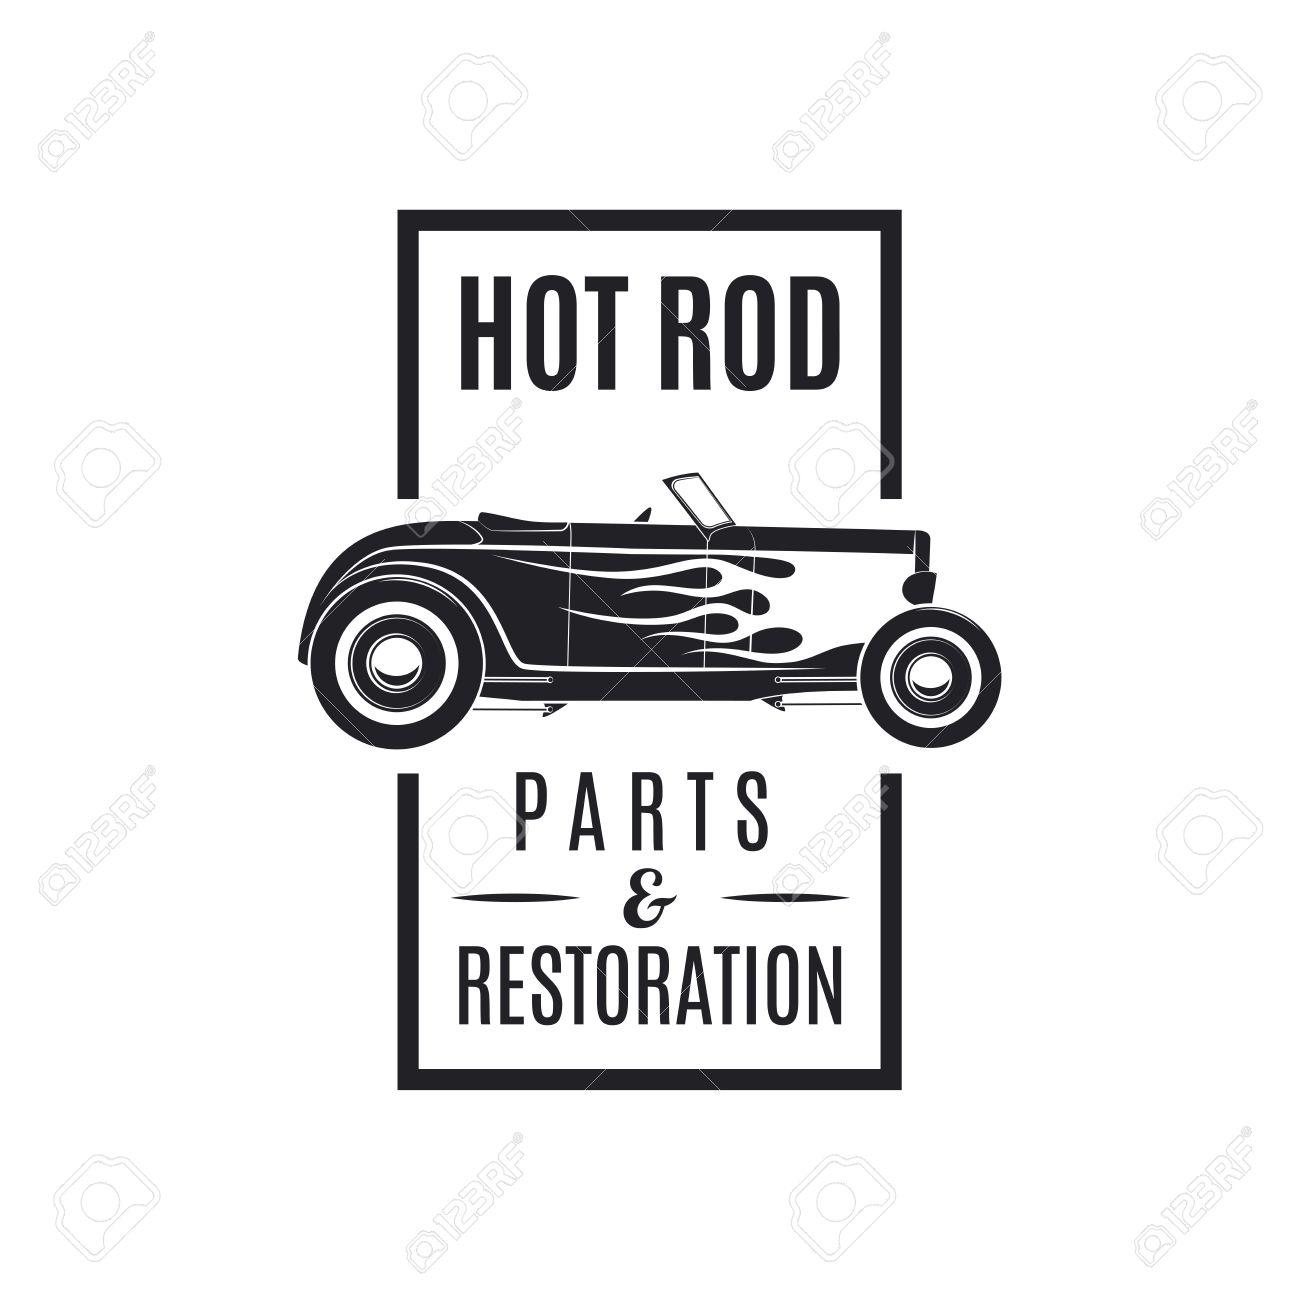 Vintage Vecor Hot Rod Icon. Hot Rod Parts Restoration. Royalty ...